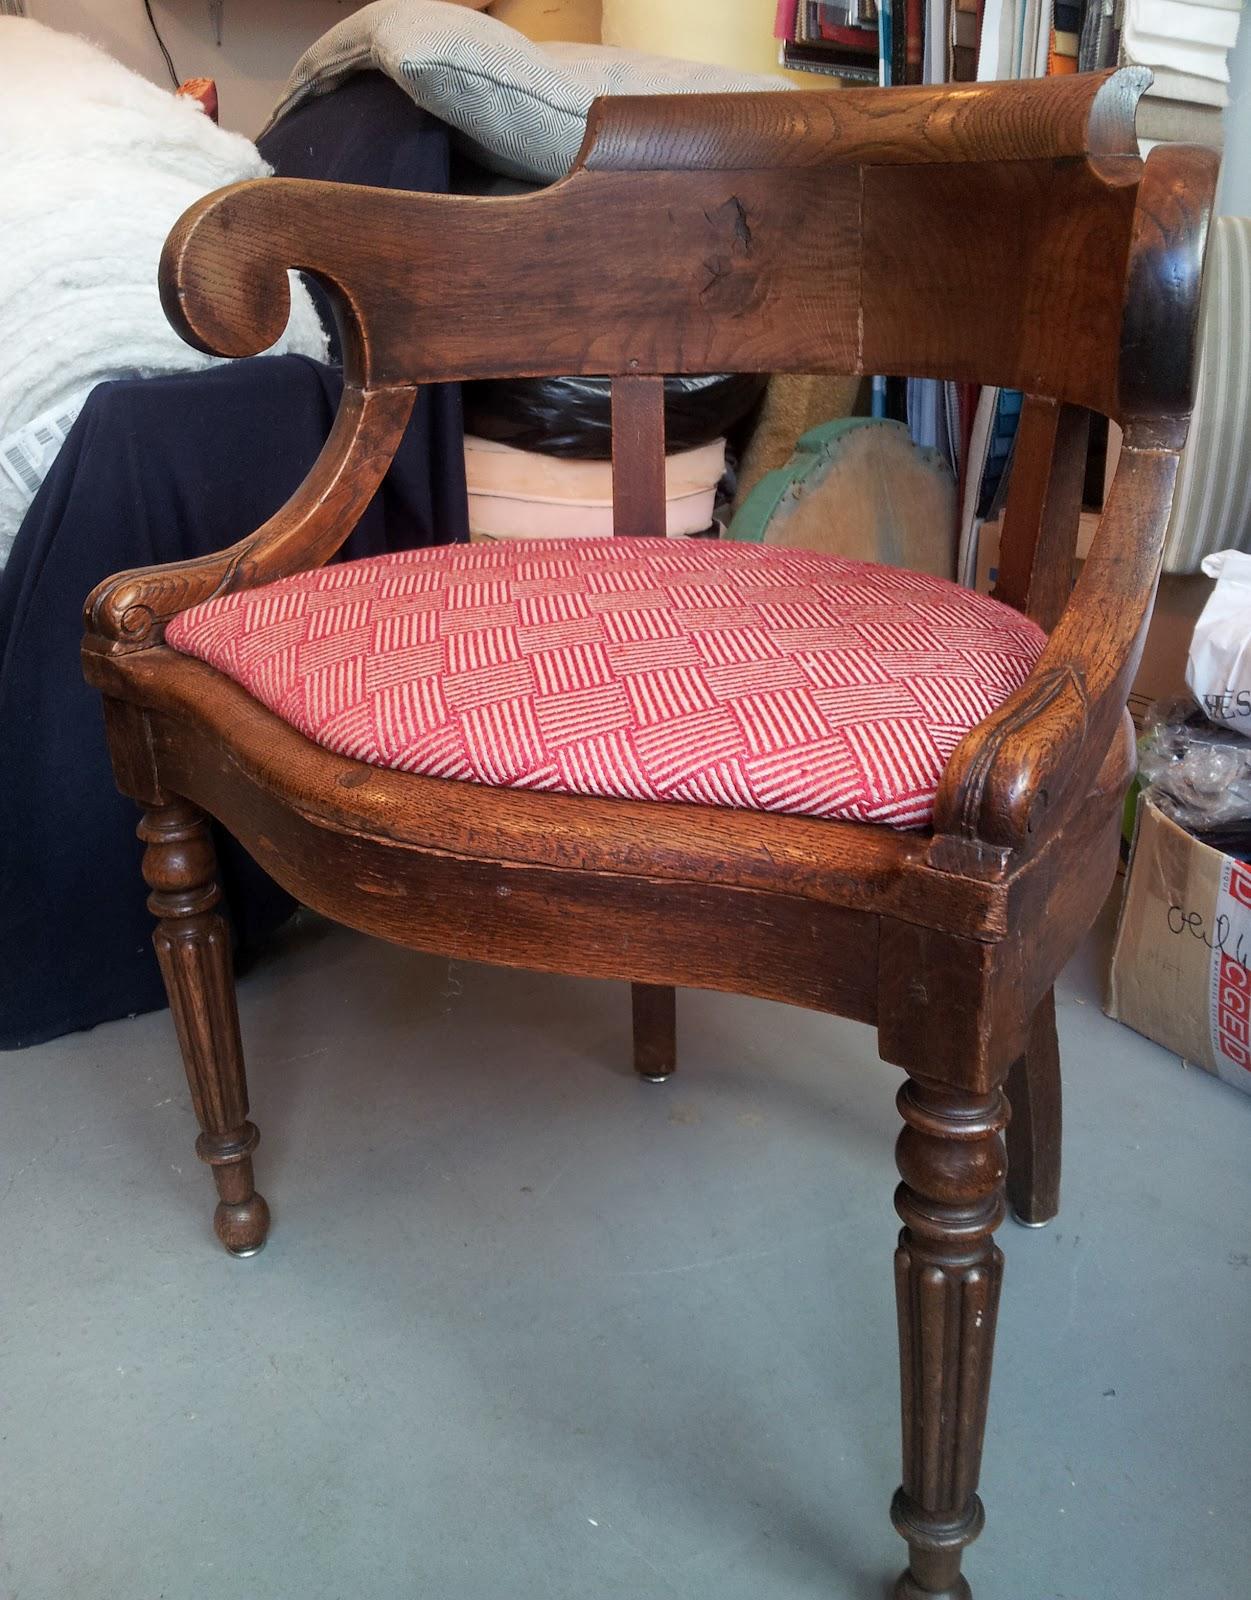 avant apr s fauteuil bureau napoleon iii atelier velvet artisan tapissier paris 10e. Black Bedroom Furniture Sets. Home Design Ideas